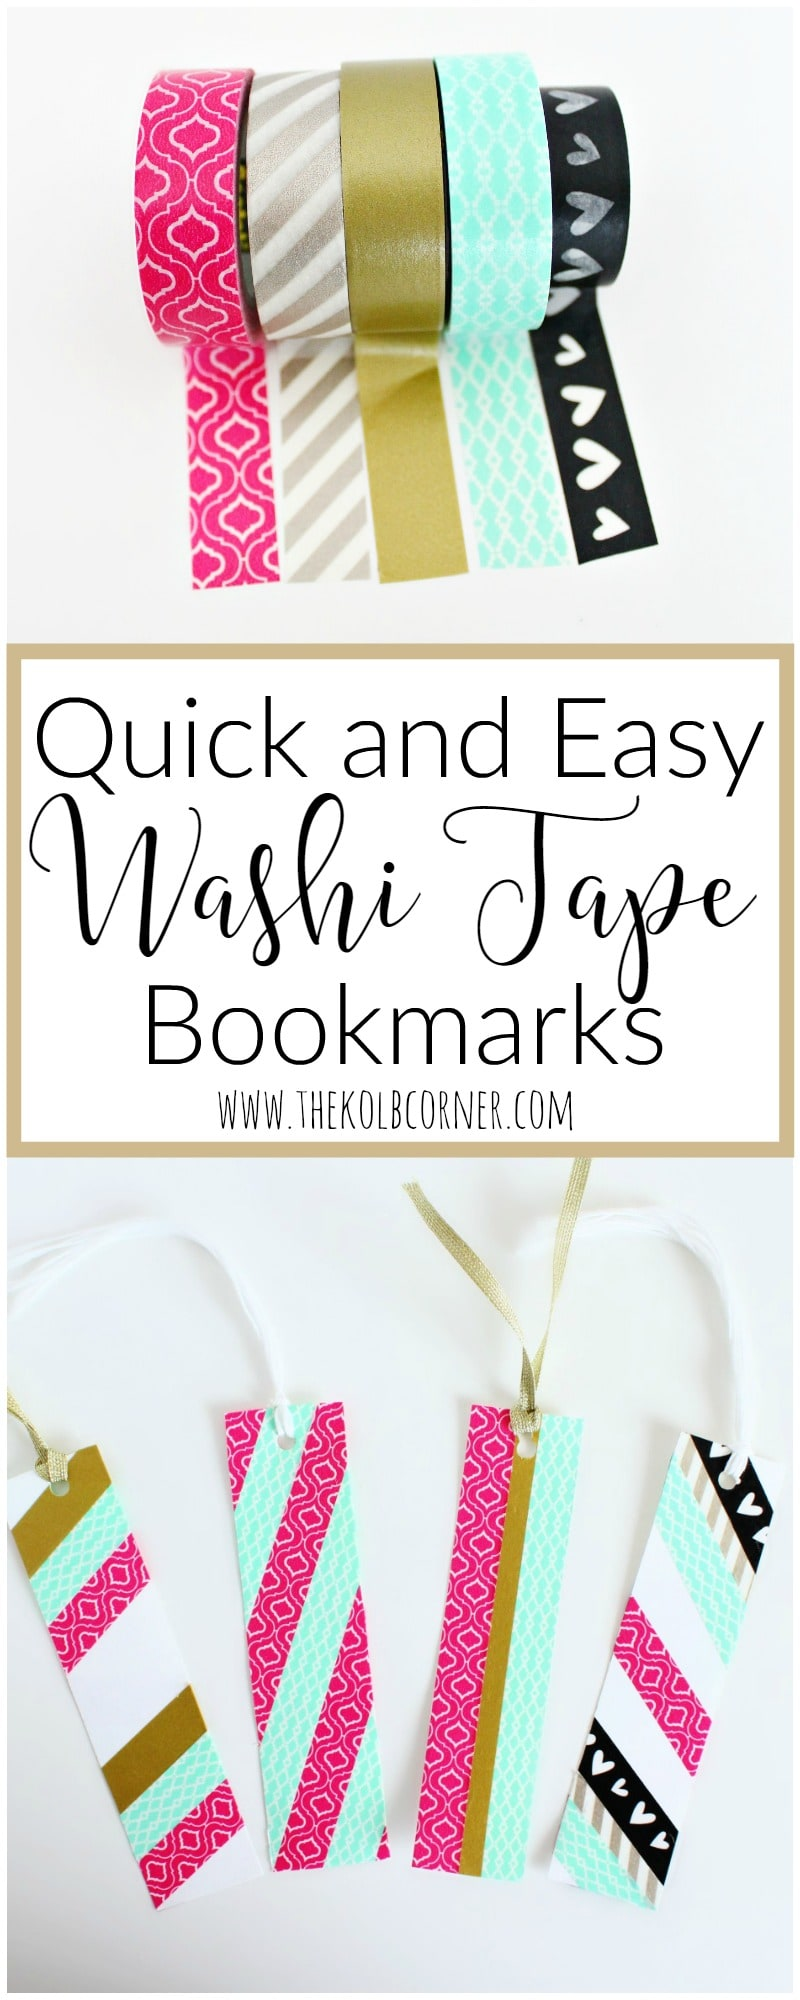 Washi Tape Bookmarks Pin